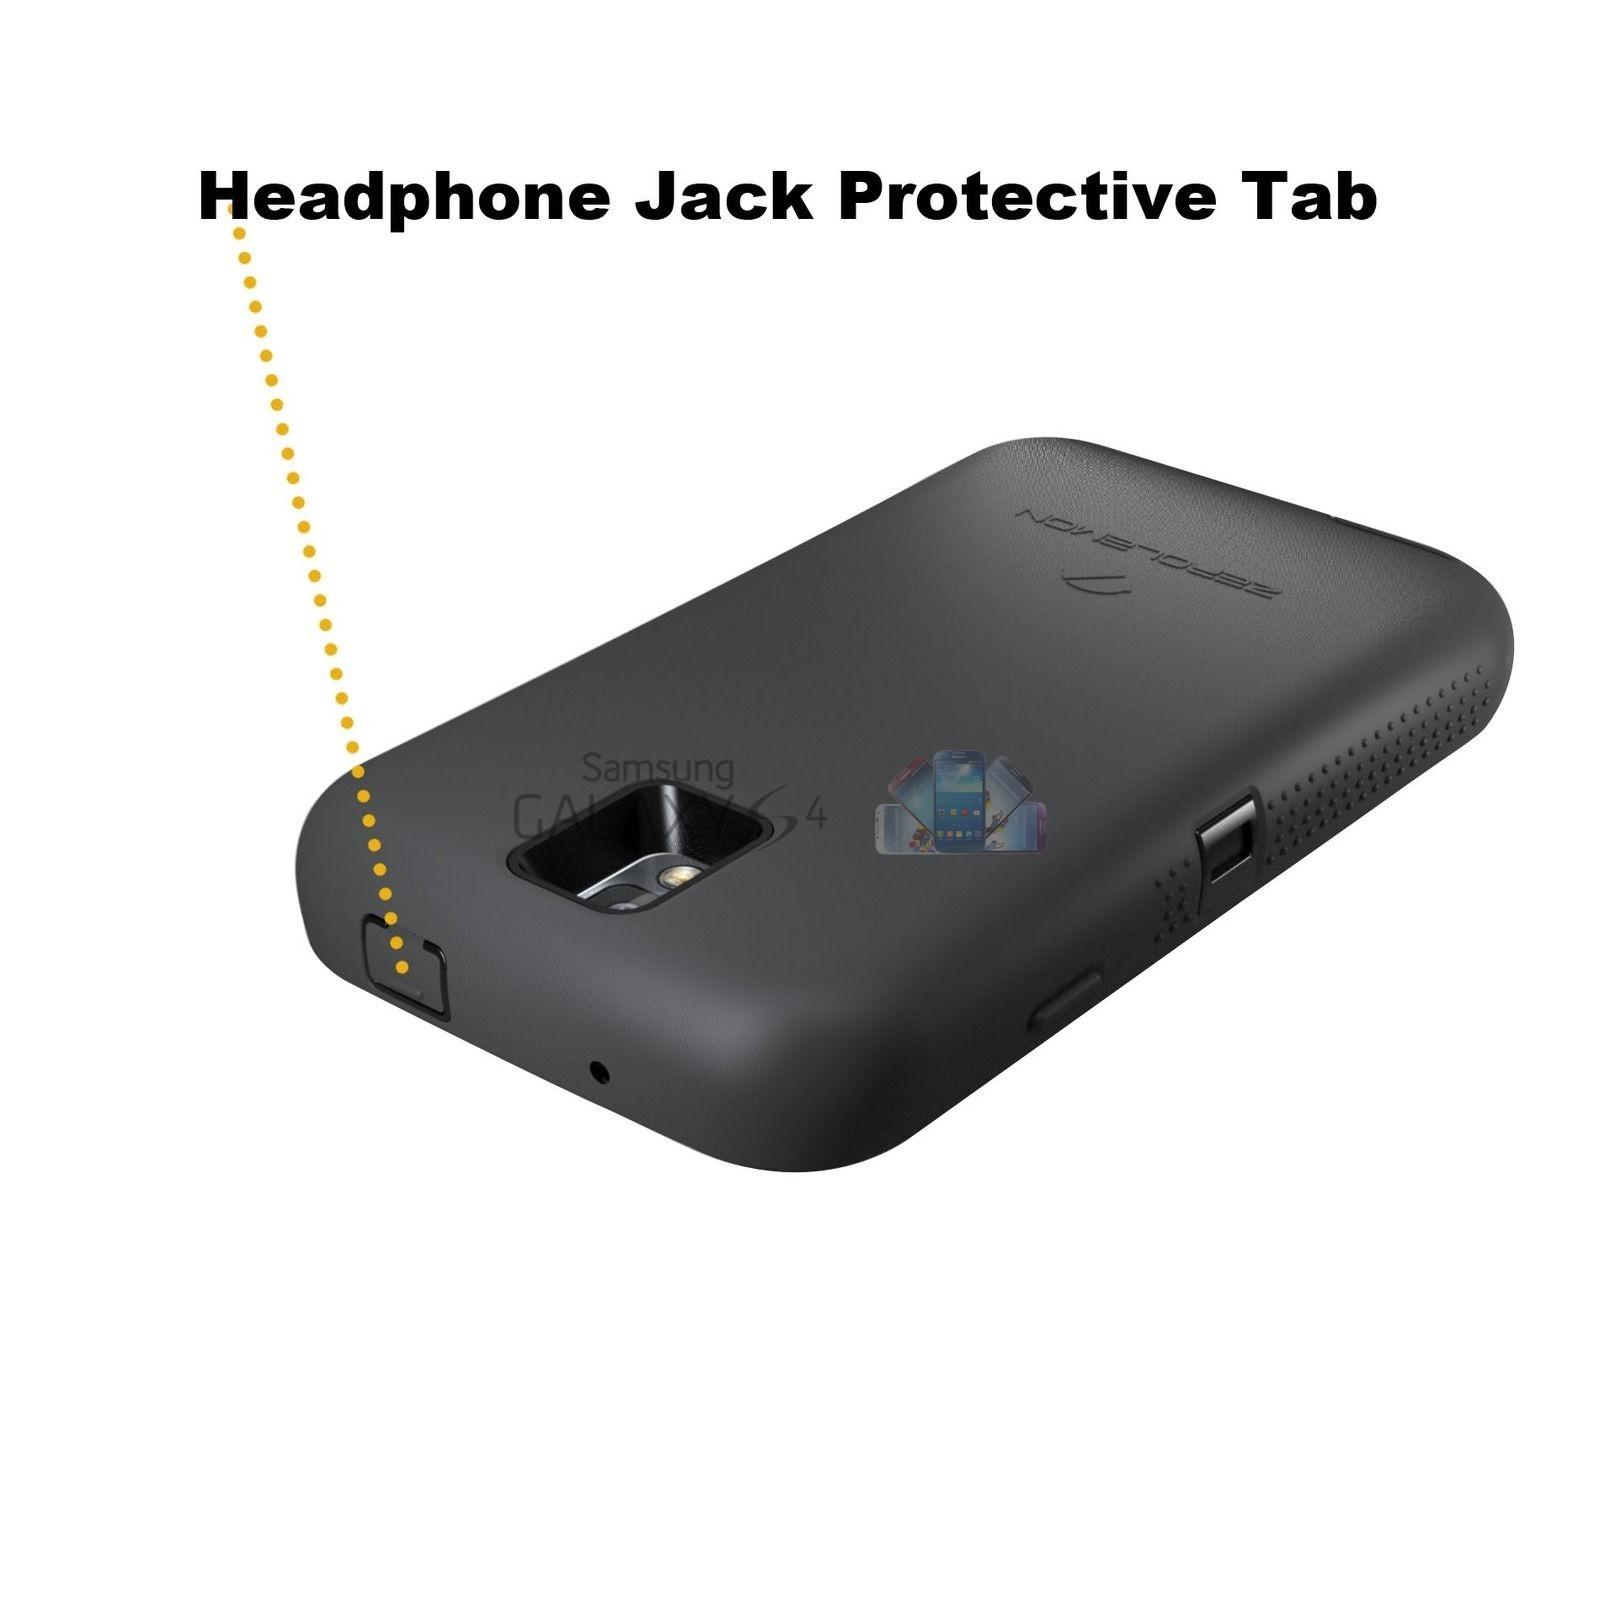 Аккумулятор ZeroLemon на 10000 мАч для Galaxy Note 3